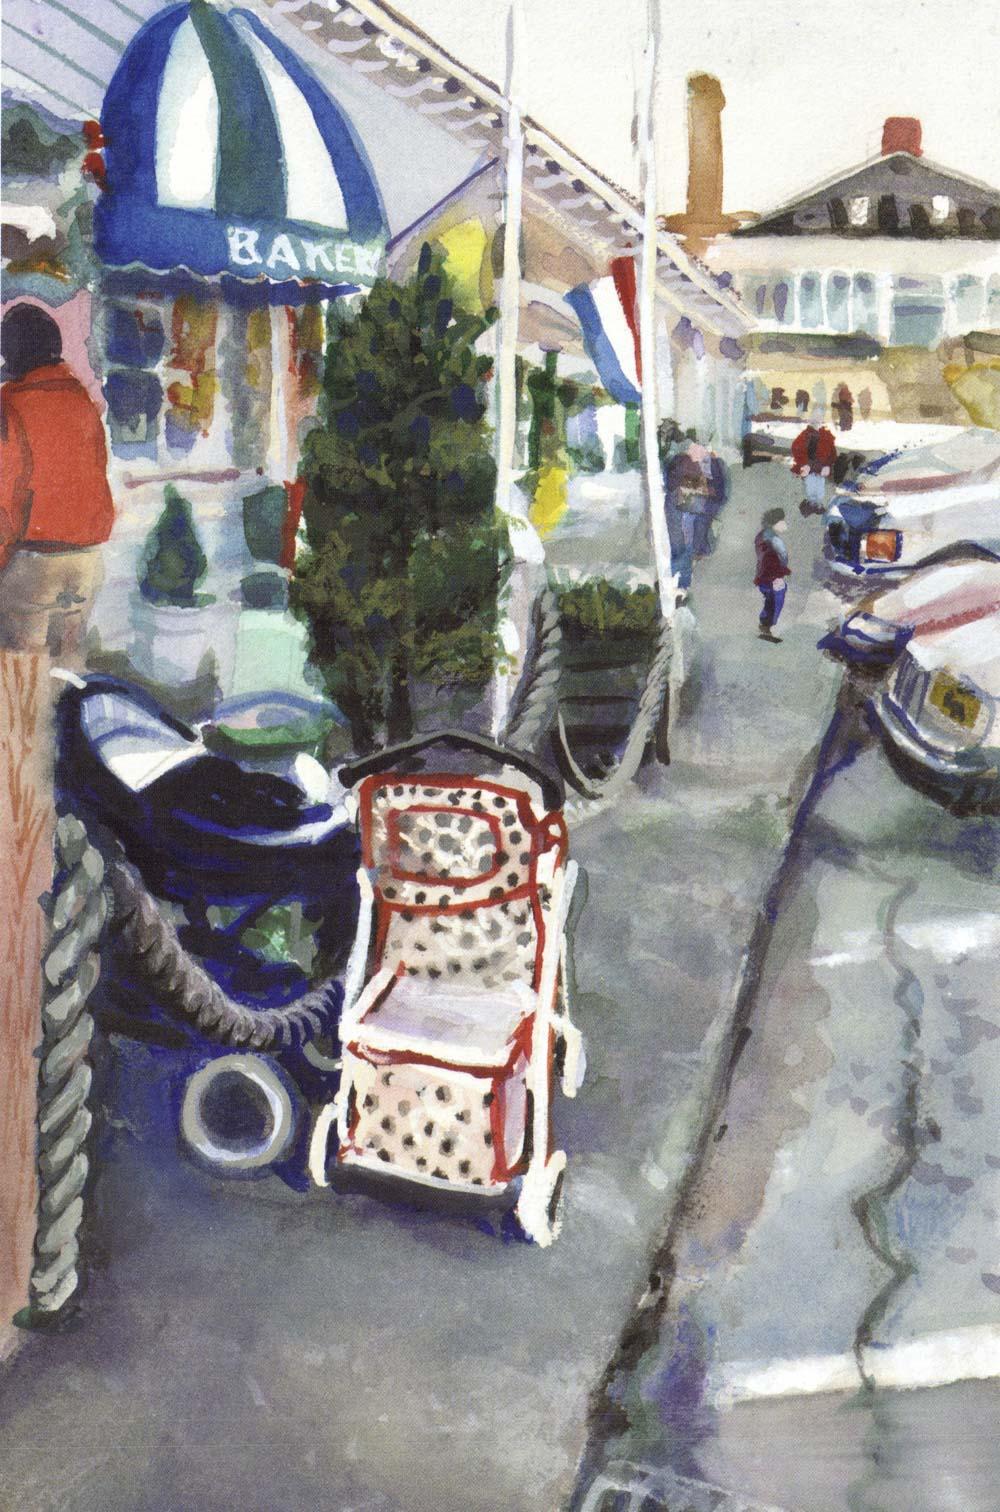 Jamestown waterfront, Fall 1997